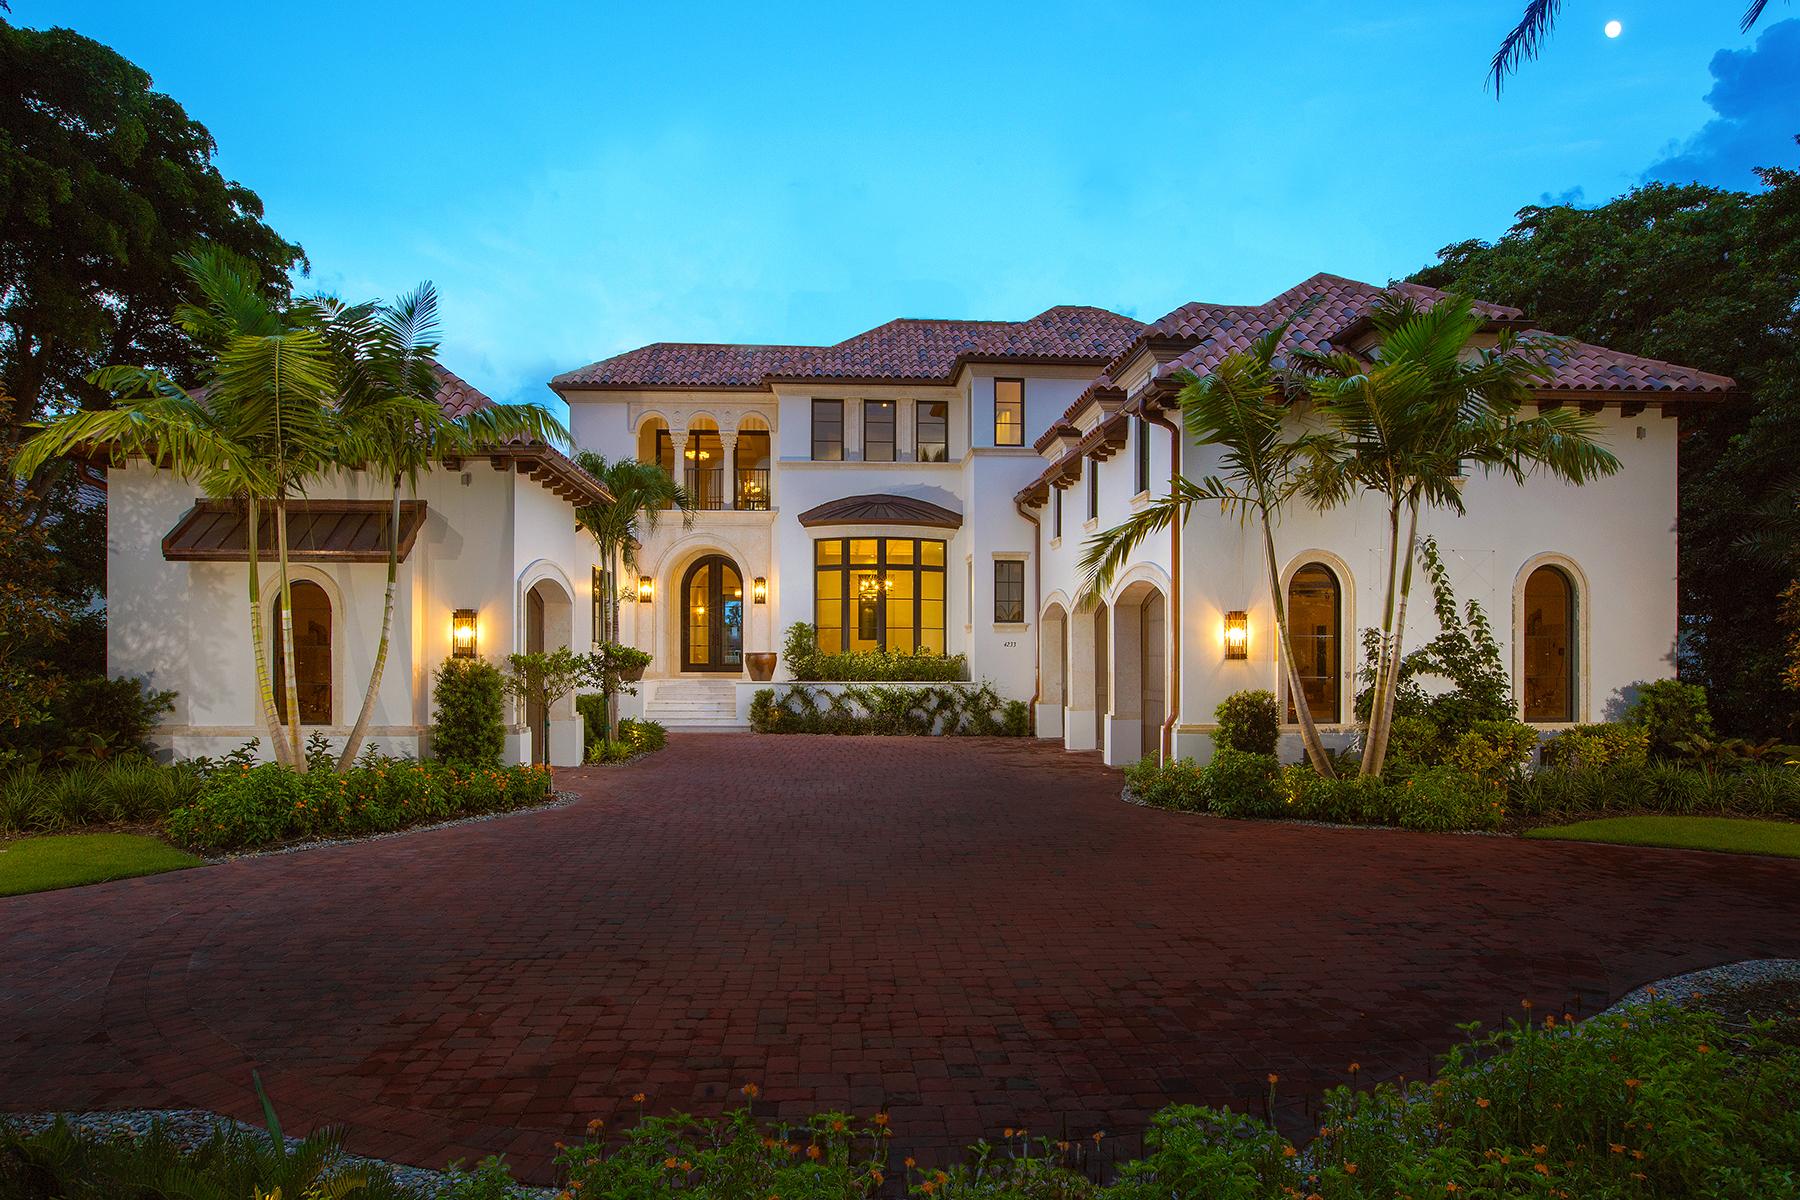 Single Family Home for Sale at Naples 4233 Gordon Dr Port Royal, Naples, Florida, 34102 United States